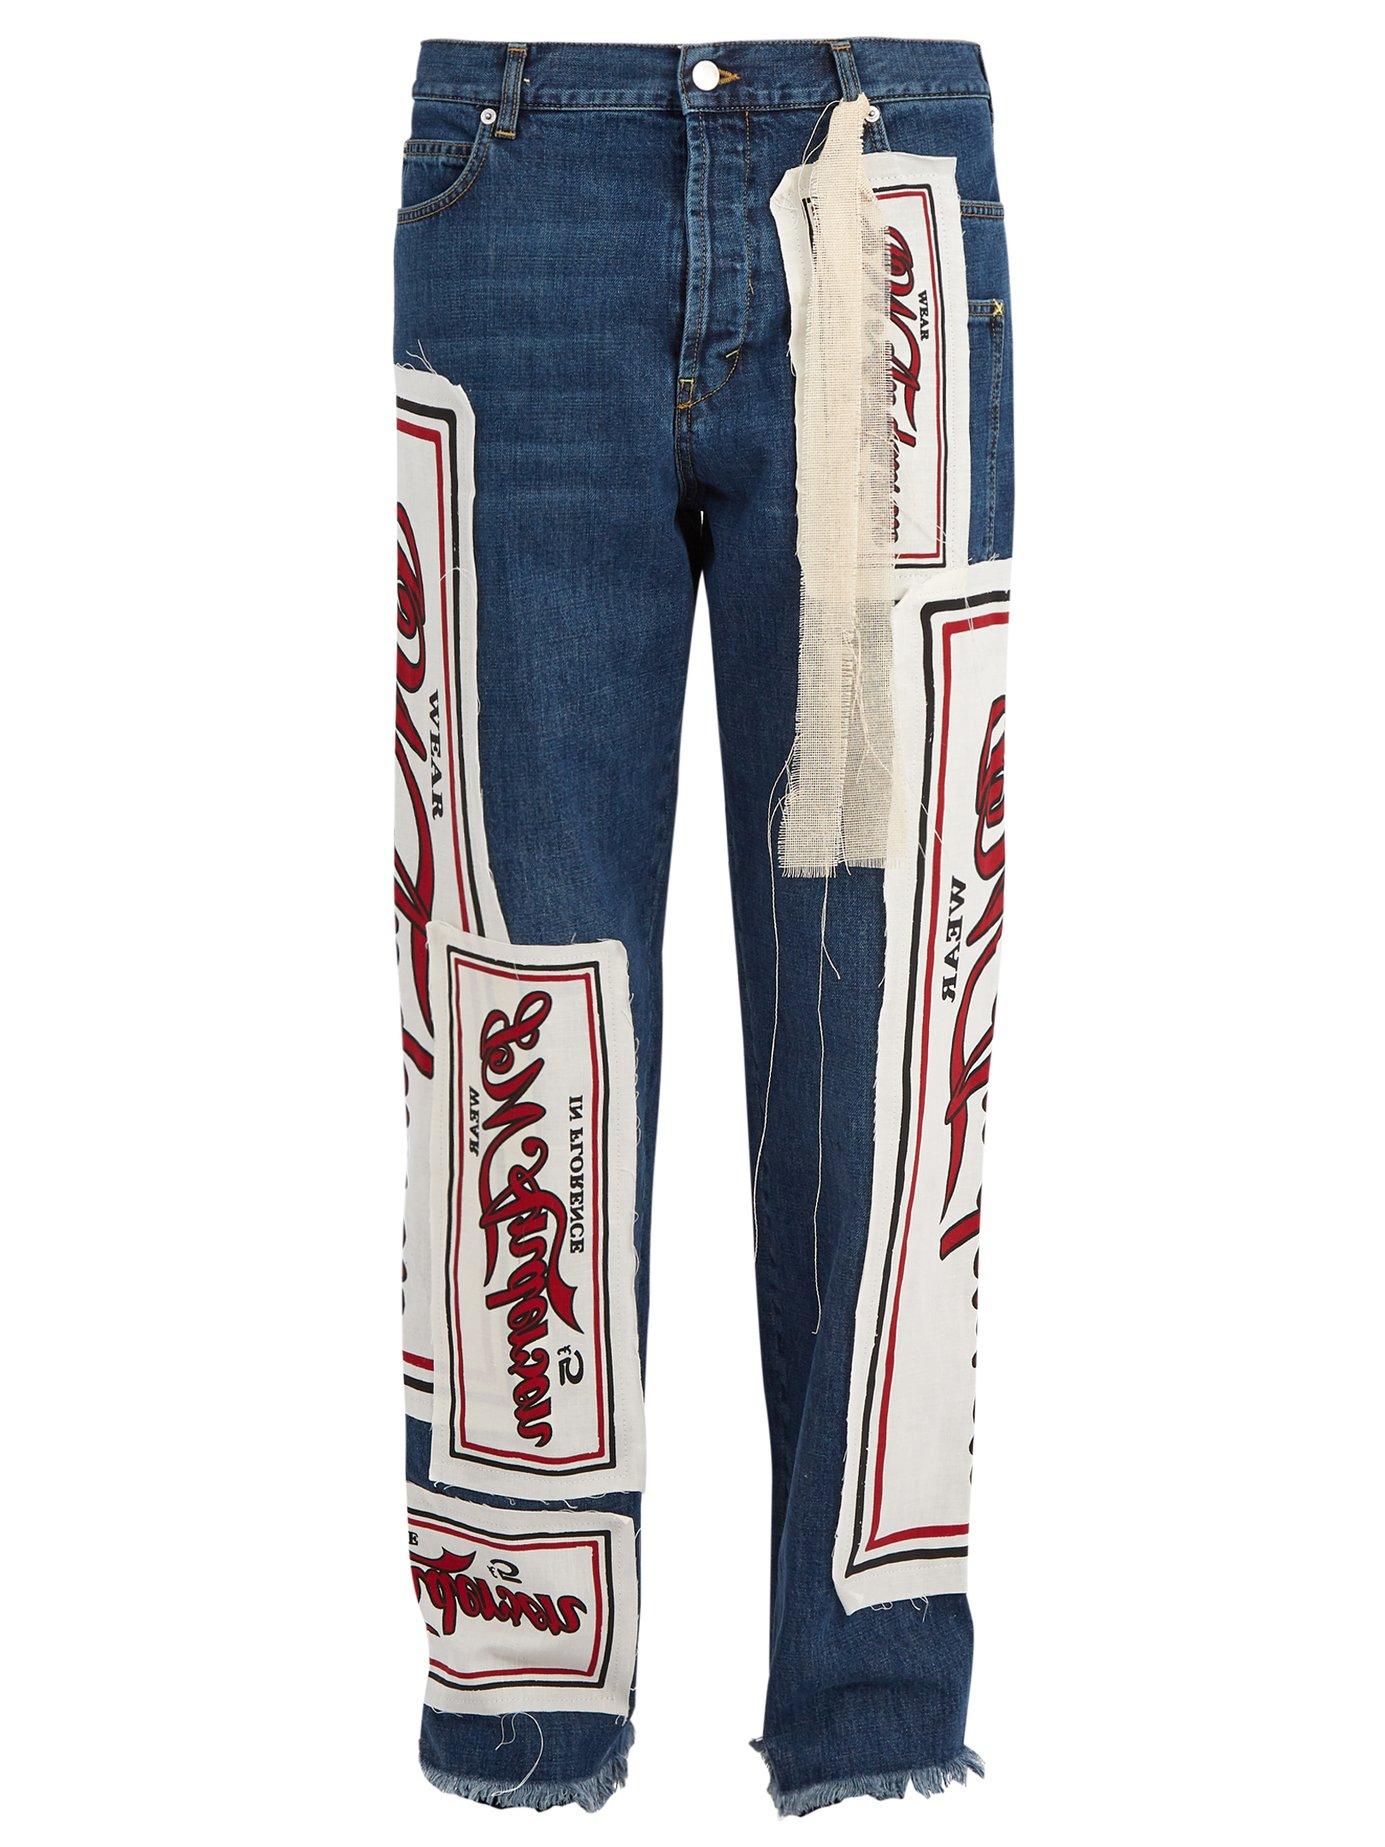 JW ANDERSON Printed-appliqué straight-leg jeans $630,  MatchesFashion.com